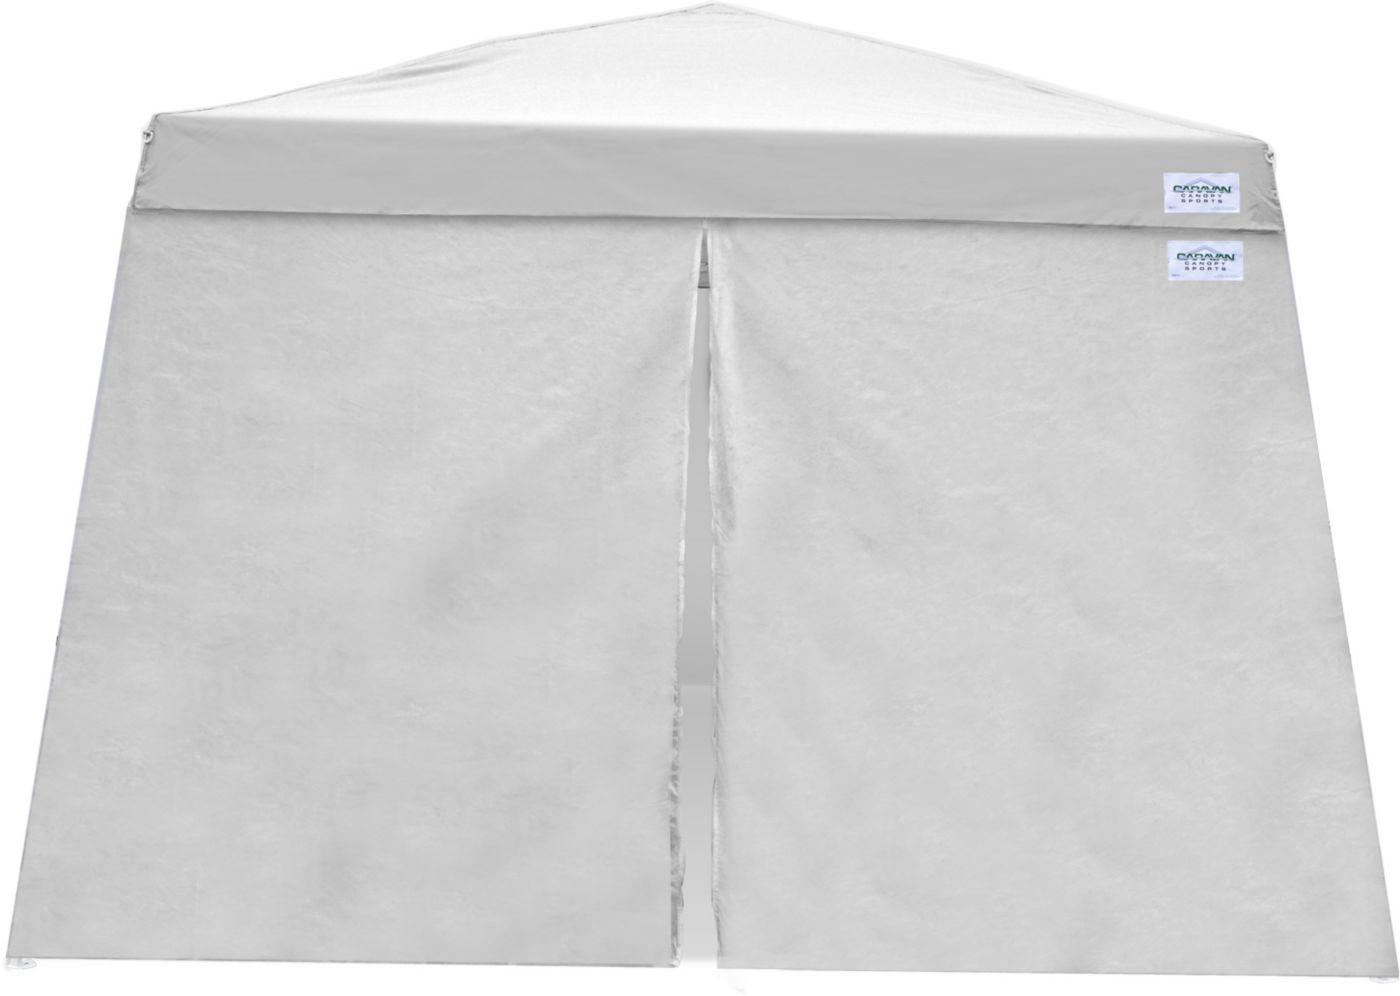 Caravan Canopy 10' x 10' V-Series Canopy Sidewalls